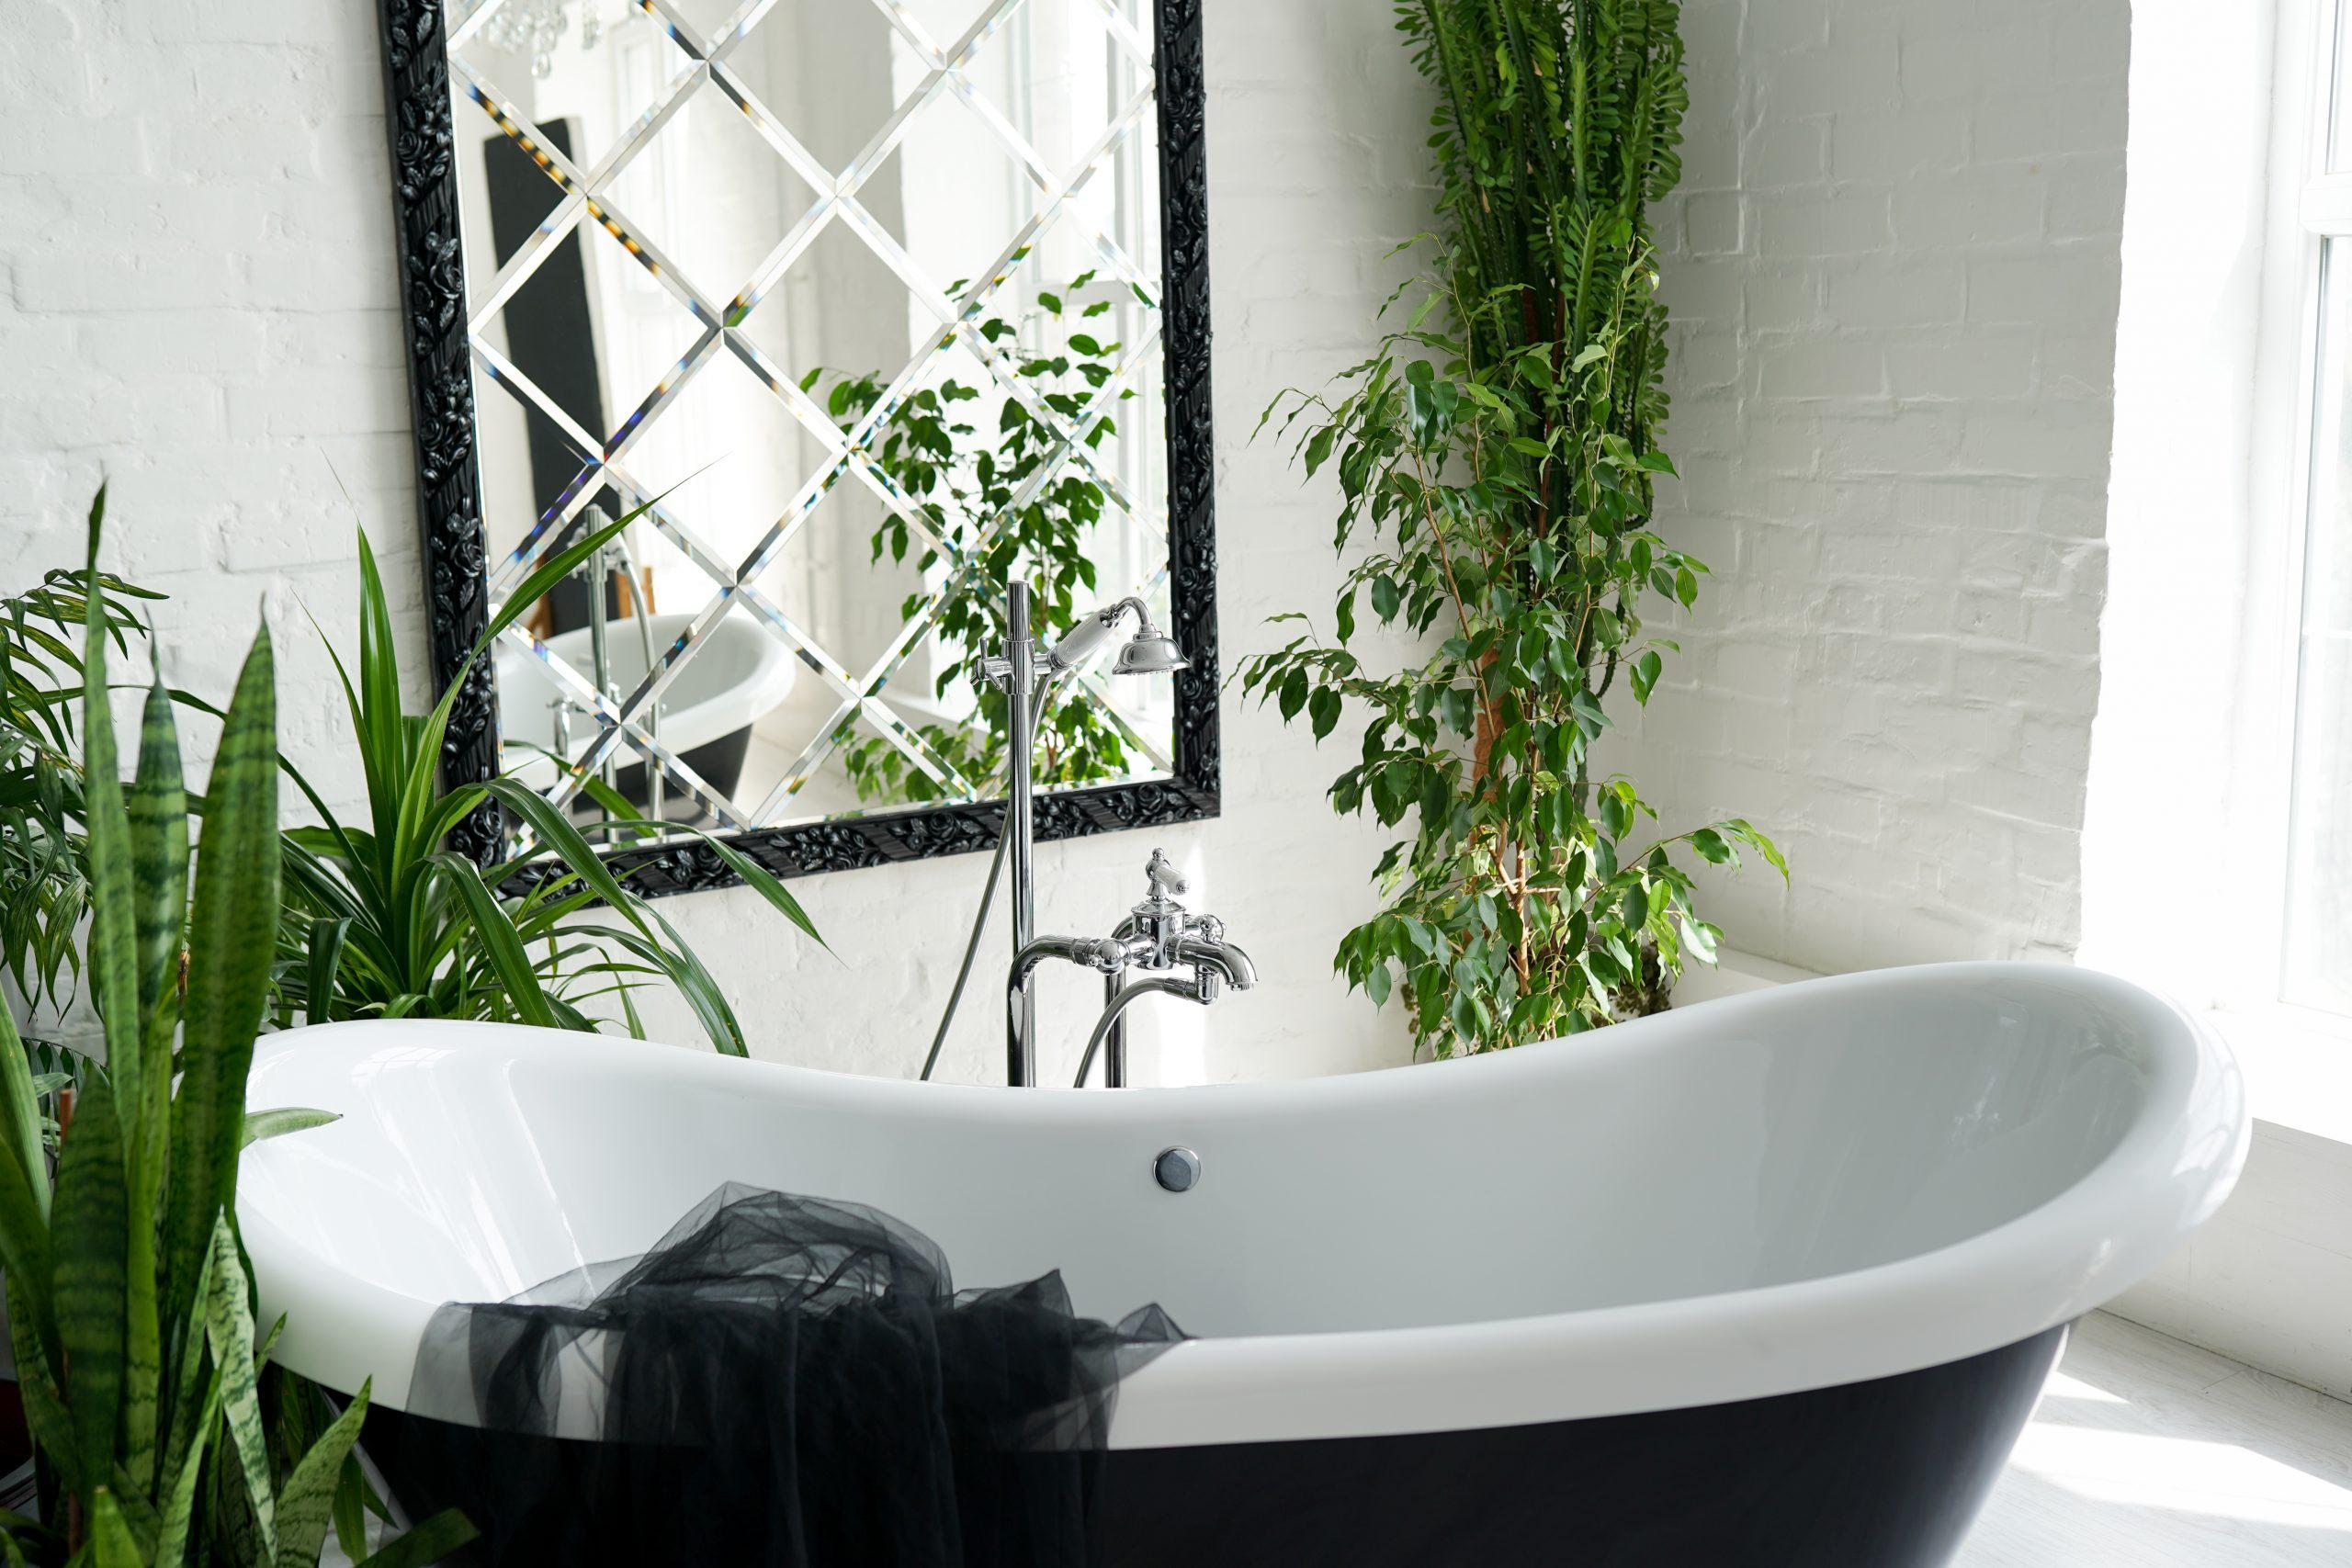 bathtub and green plants in bathroom interior in l R26WMF8 1 scaled